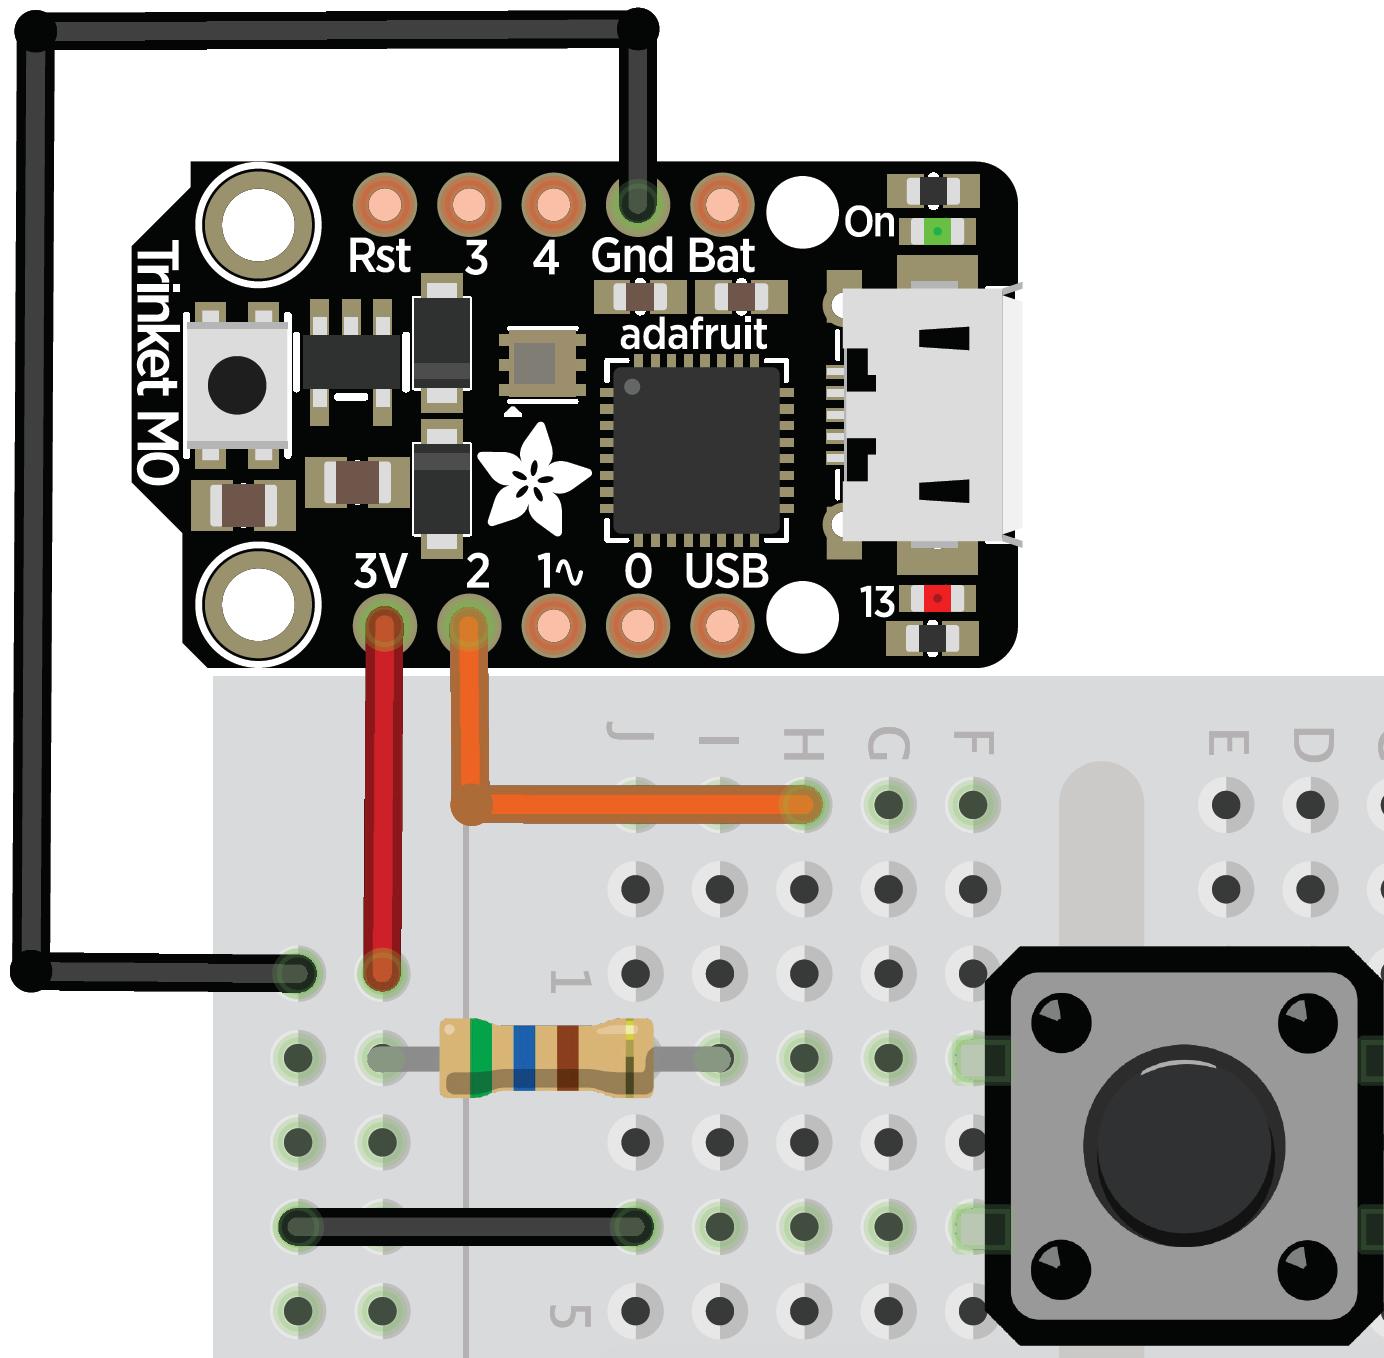 trinket-fritzing-layout_bb-hq-GUIDE-CROP_pdf.png